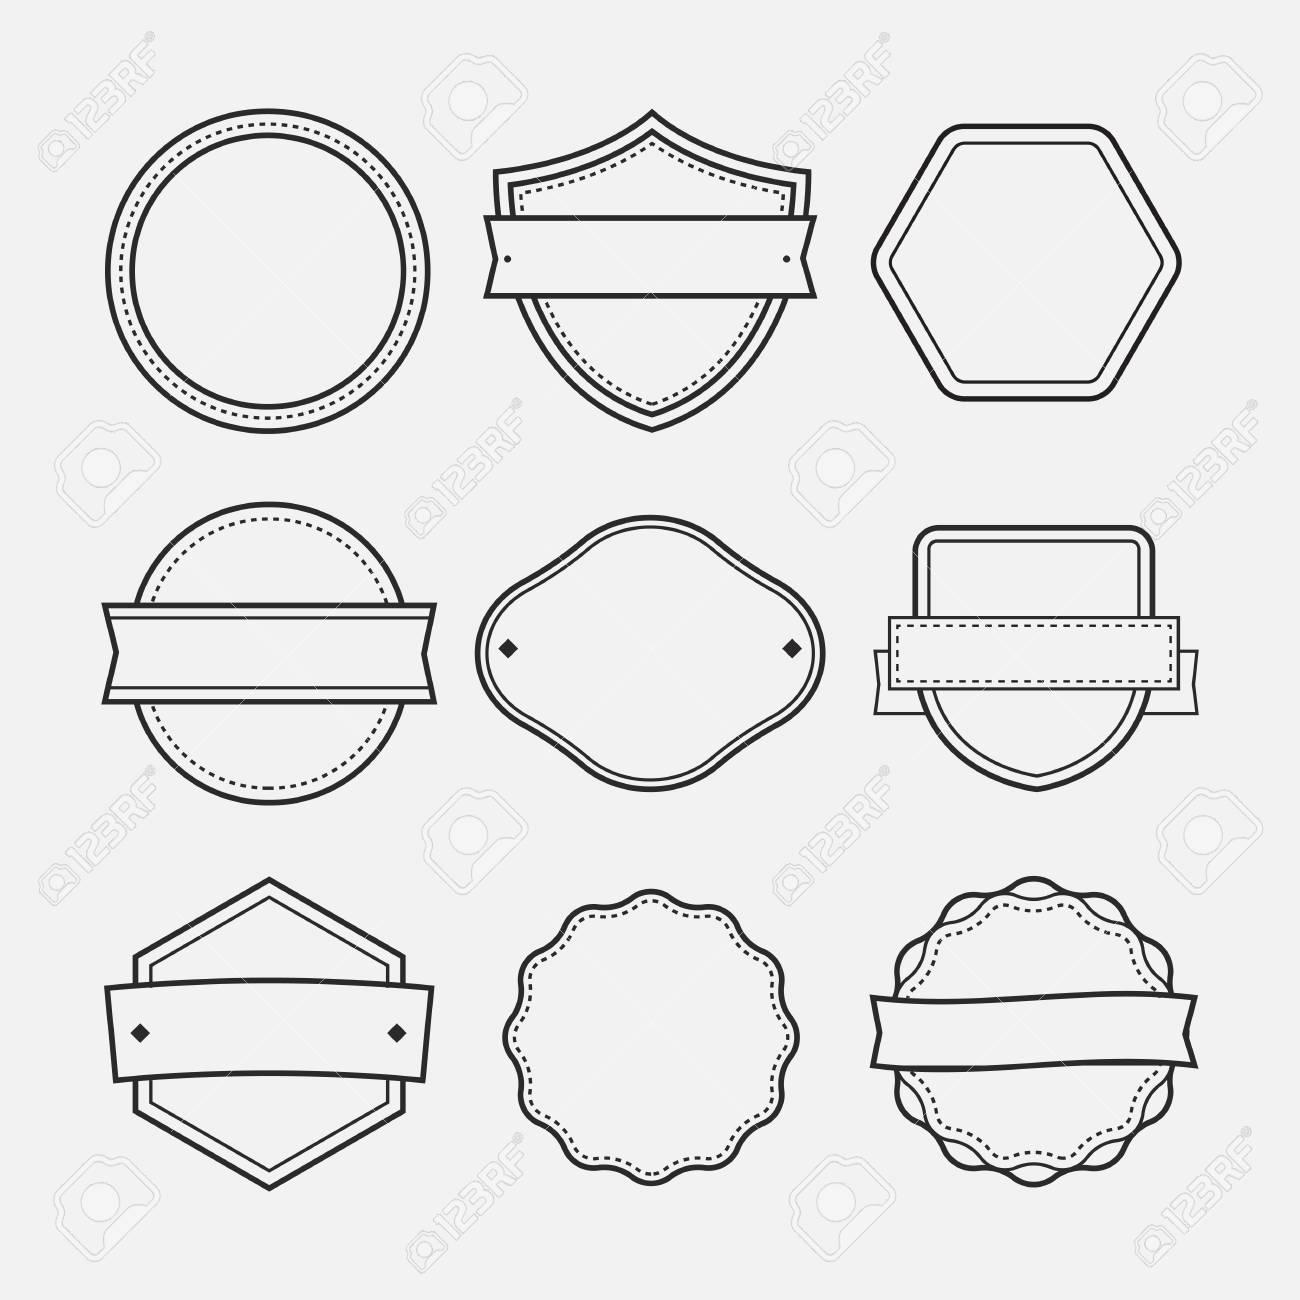 Isolated Vector Illustration. Blank Logo Frames Drawn Set. Royalty ...